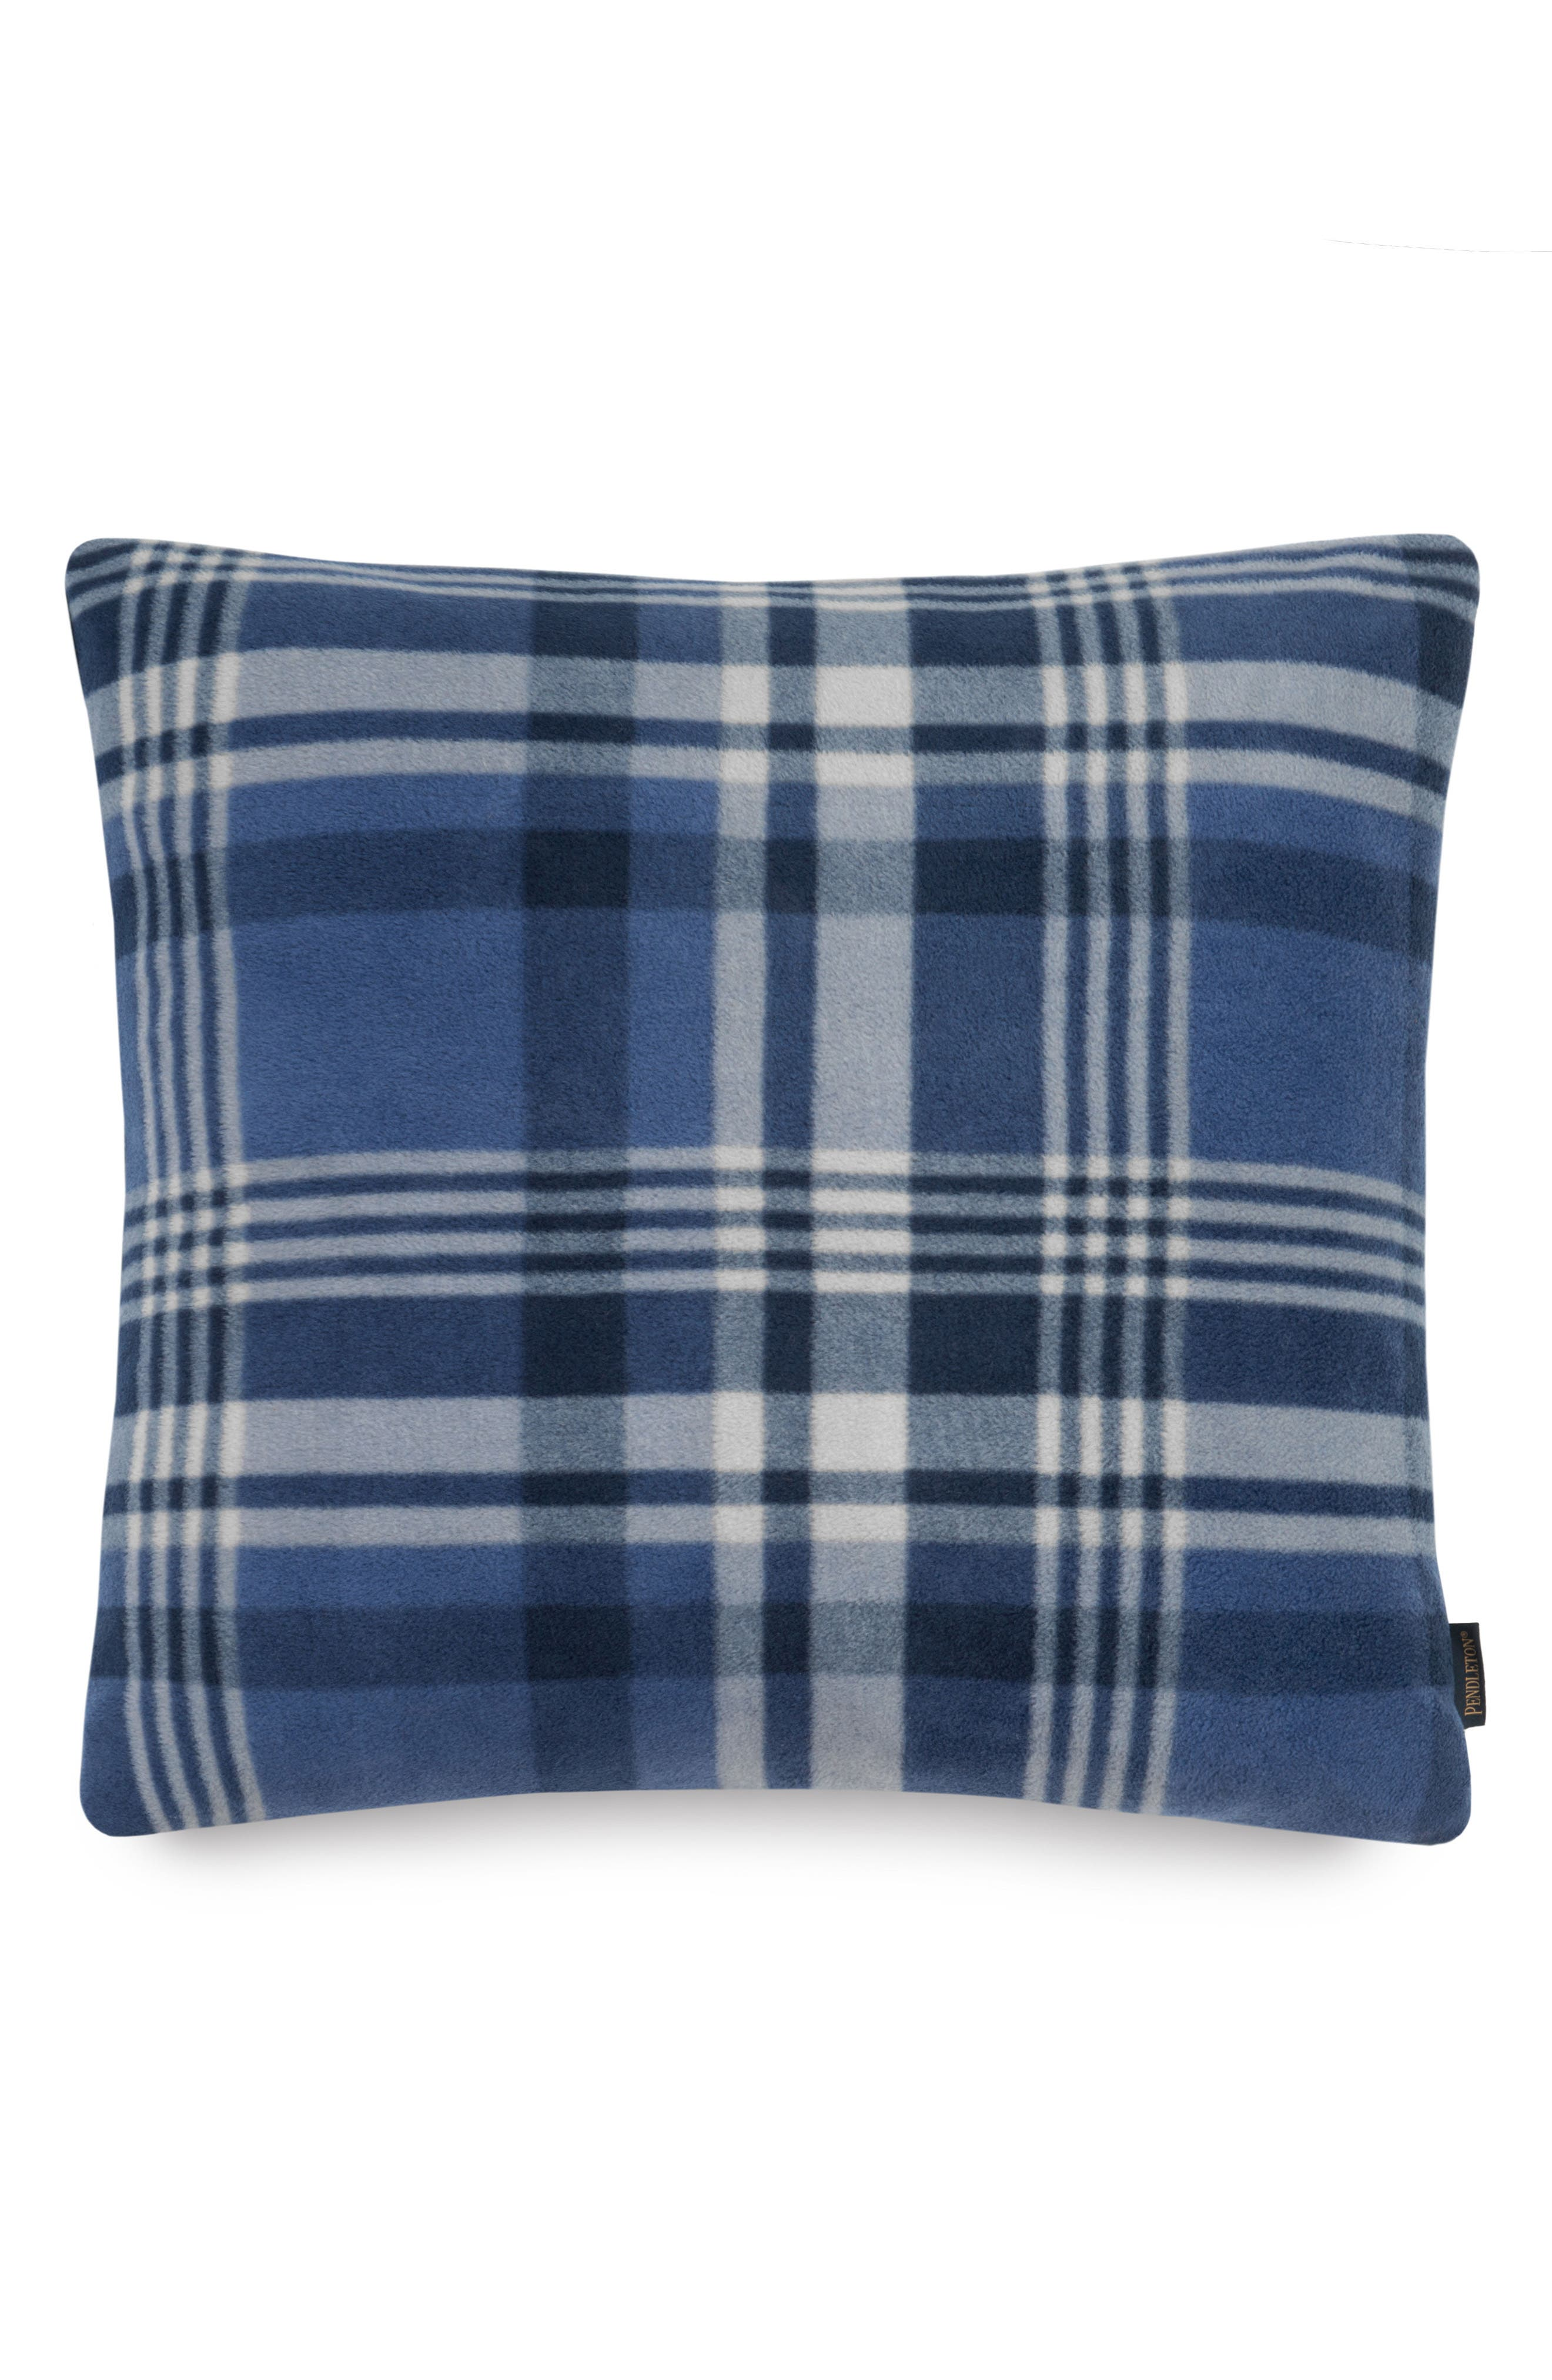 Main Image - Pendleton Teller Plaid Pillow